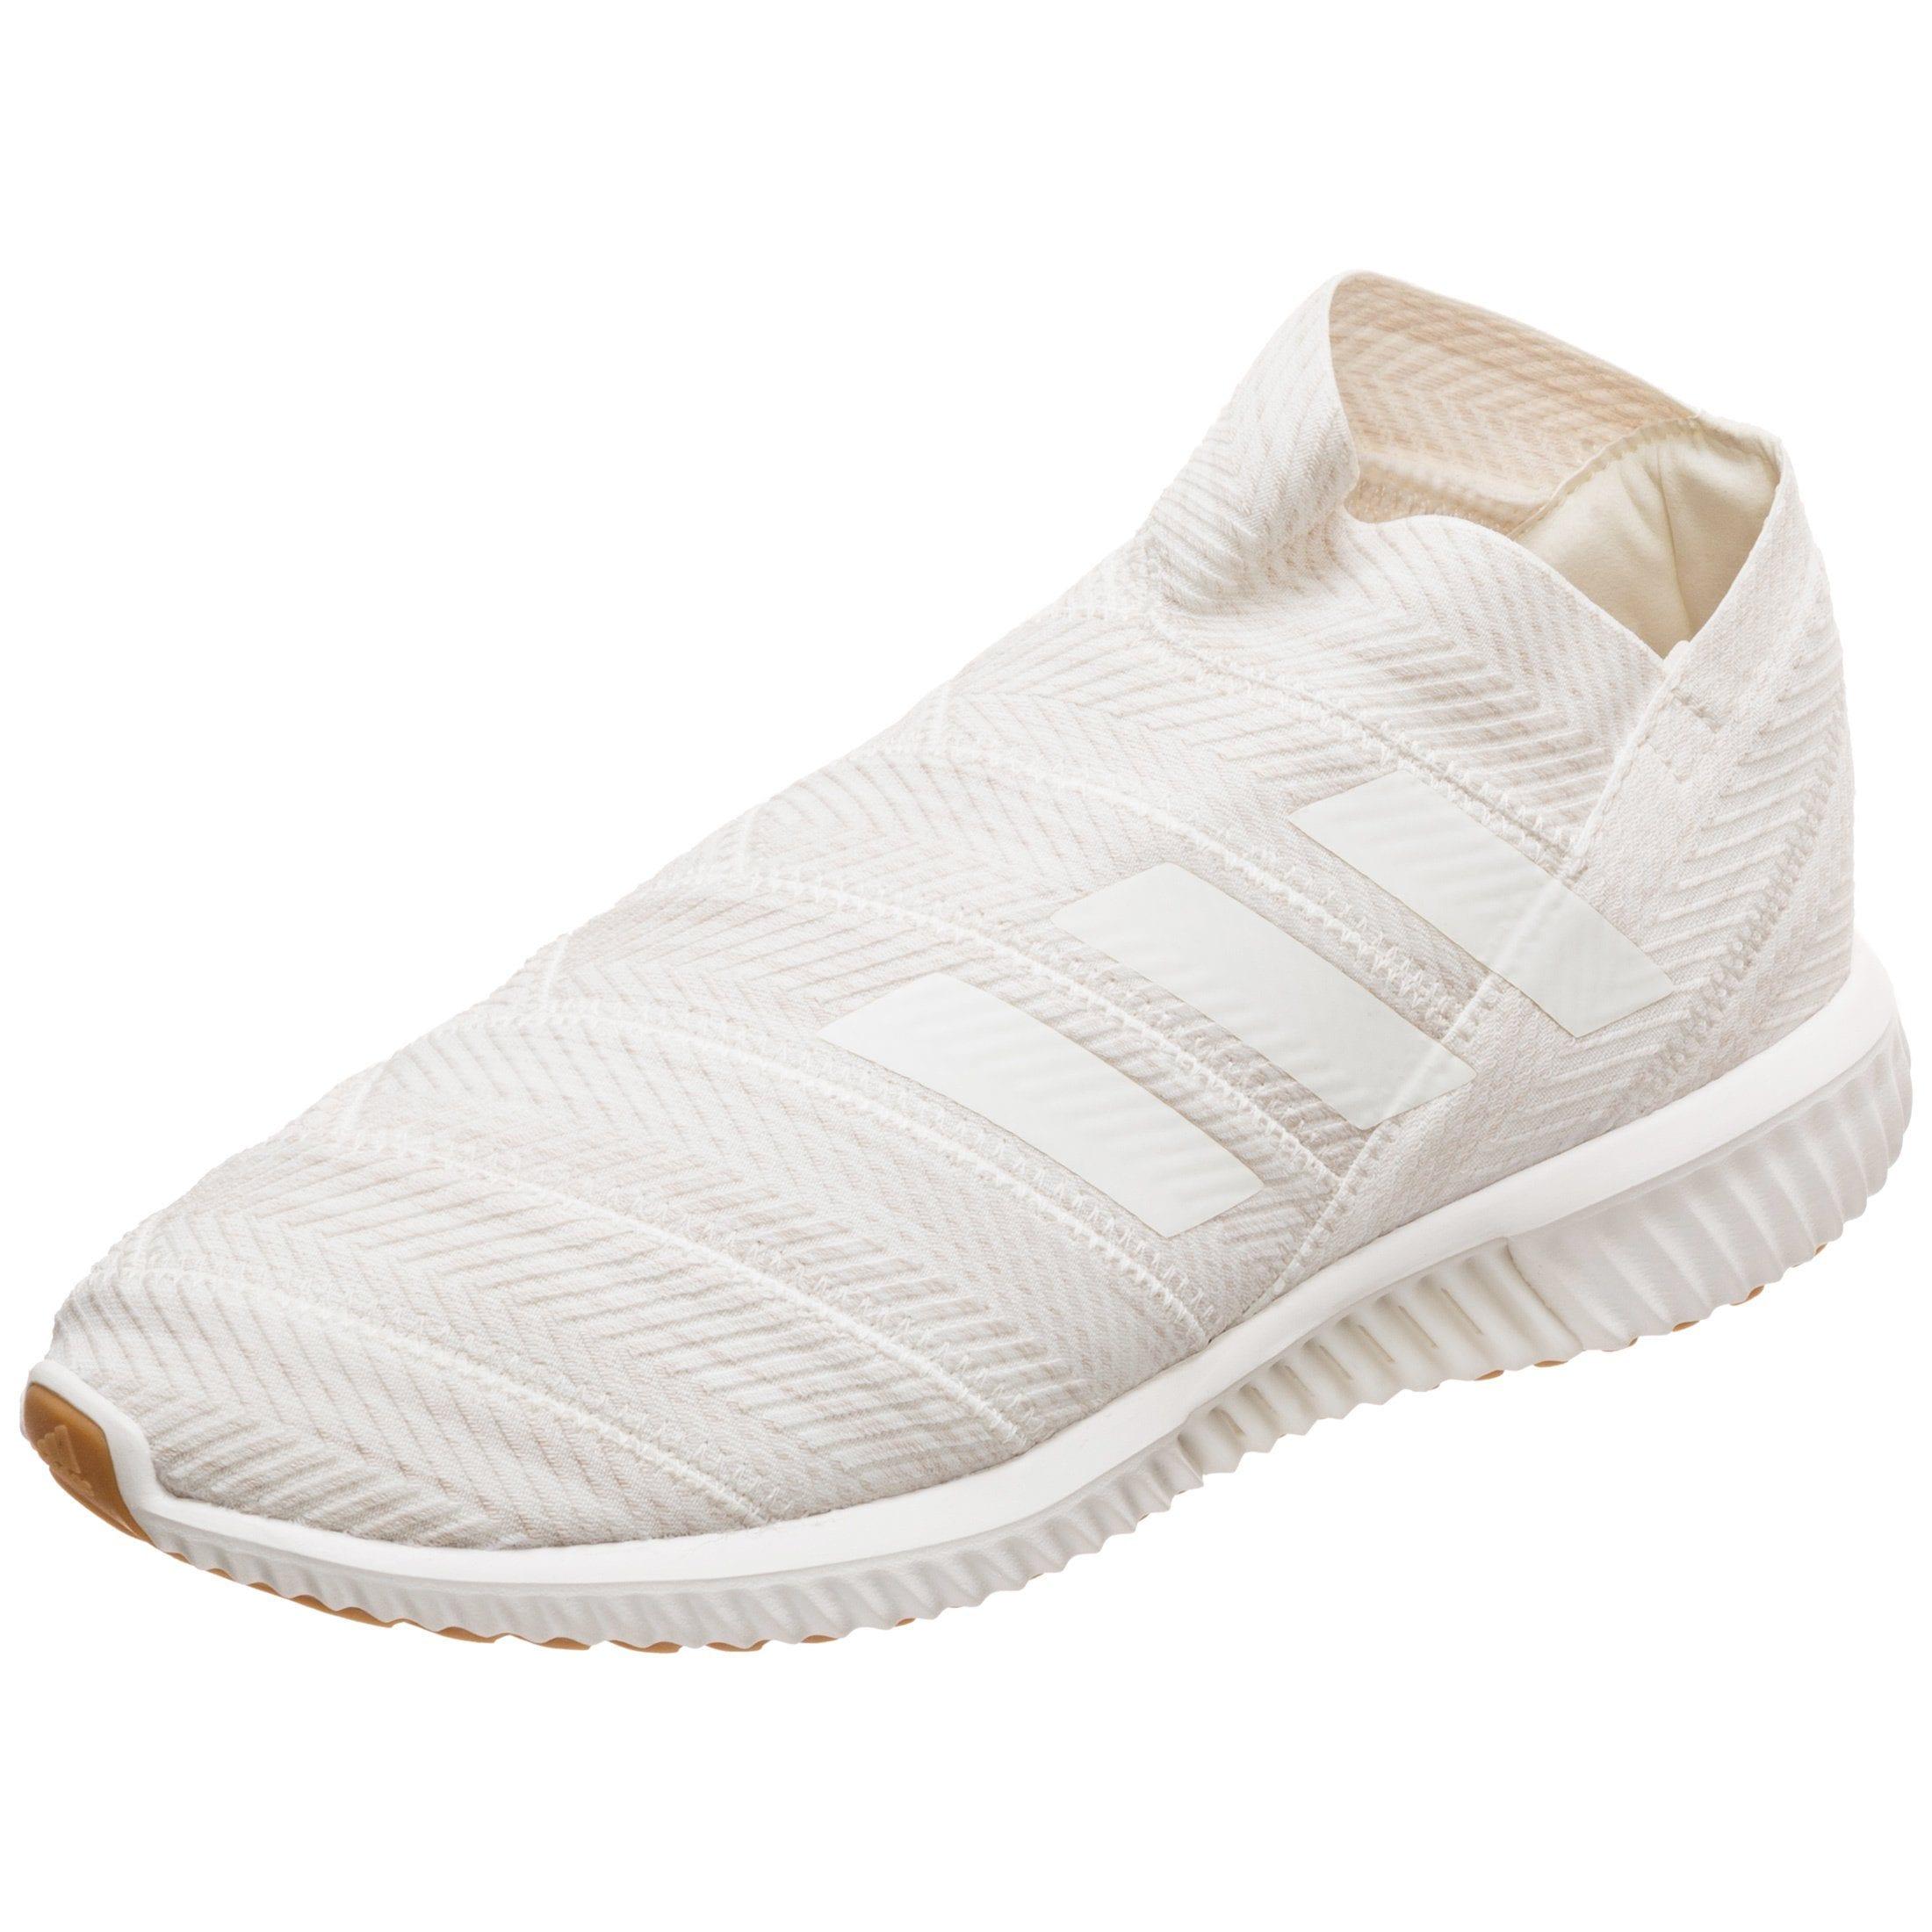 adidas Performance Fußballschuh Nemeziz 181   Schuhe > Sportschuhe > Fußballschuhe   Beige   Adidas Performance